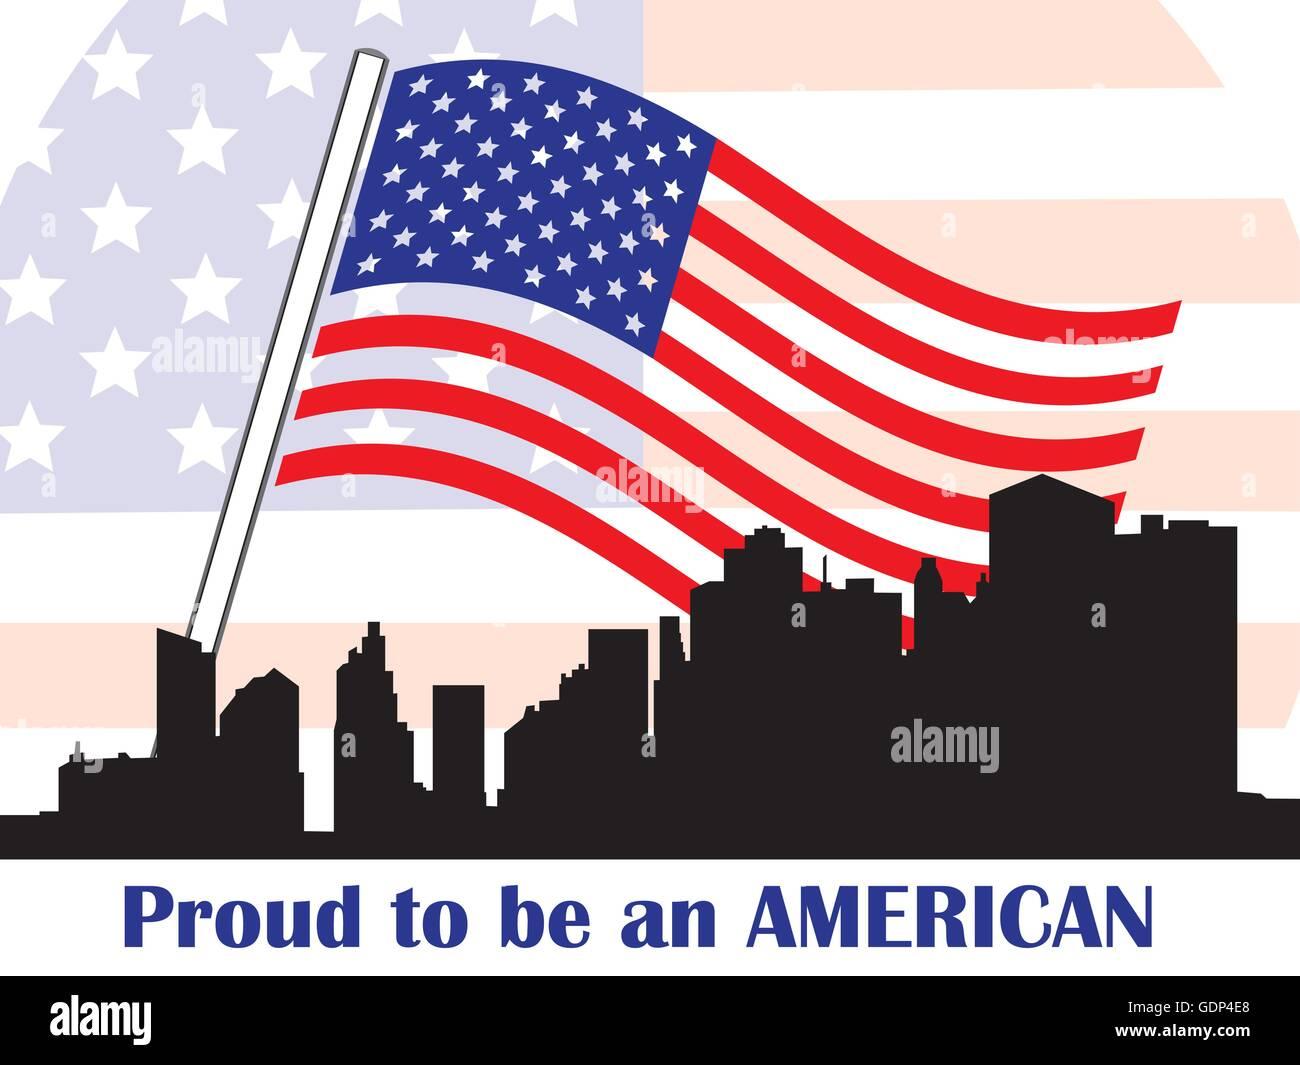 Conceptual Illustration Of Patriotic American Symbols With American